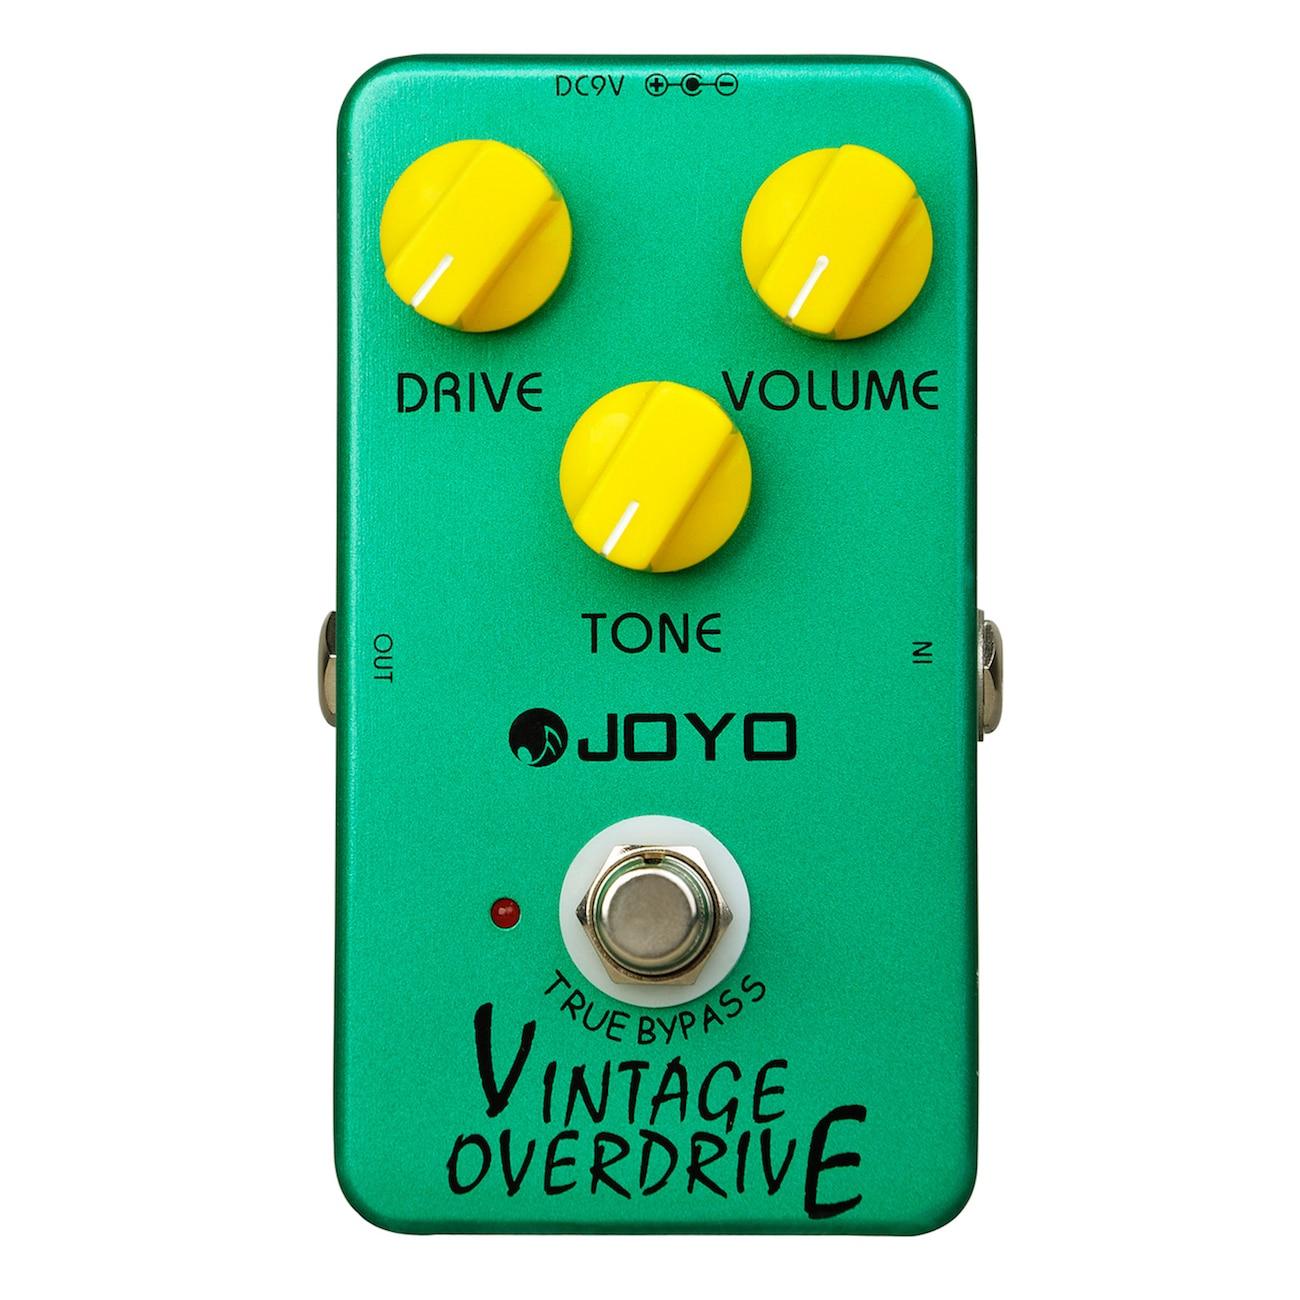 Joyo Vintage Overdrive Electric Guitar Effect Pedal True Bypass JF-01 JF01 joyo jf 39 deluxe crunch overdrive guitar pedal effect true bypass red